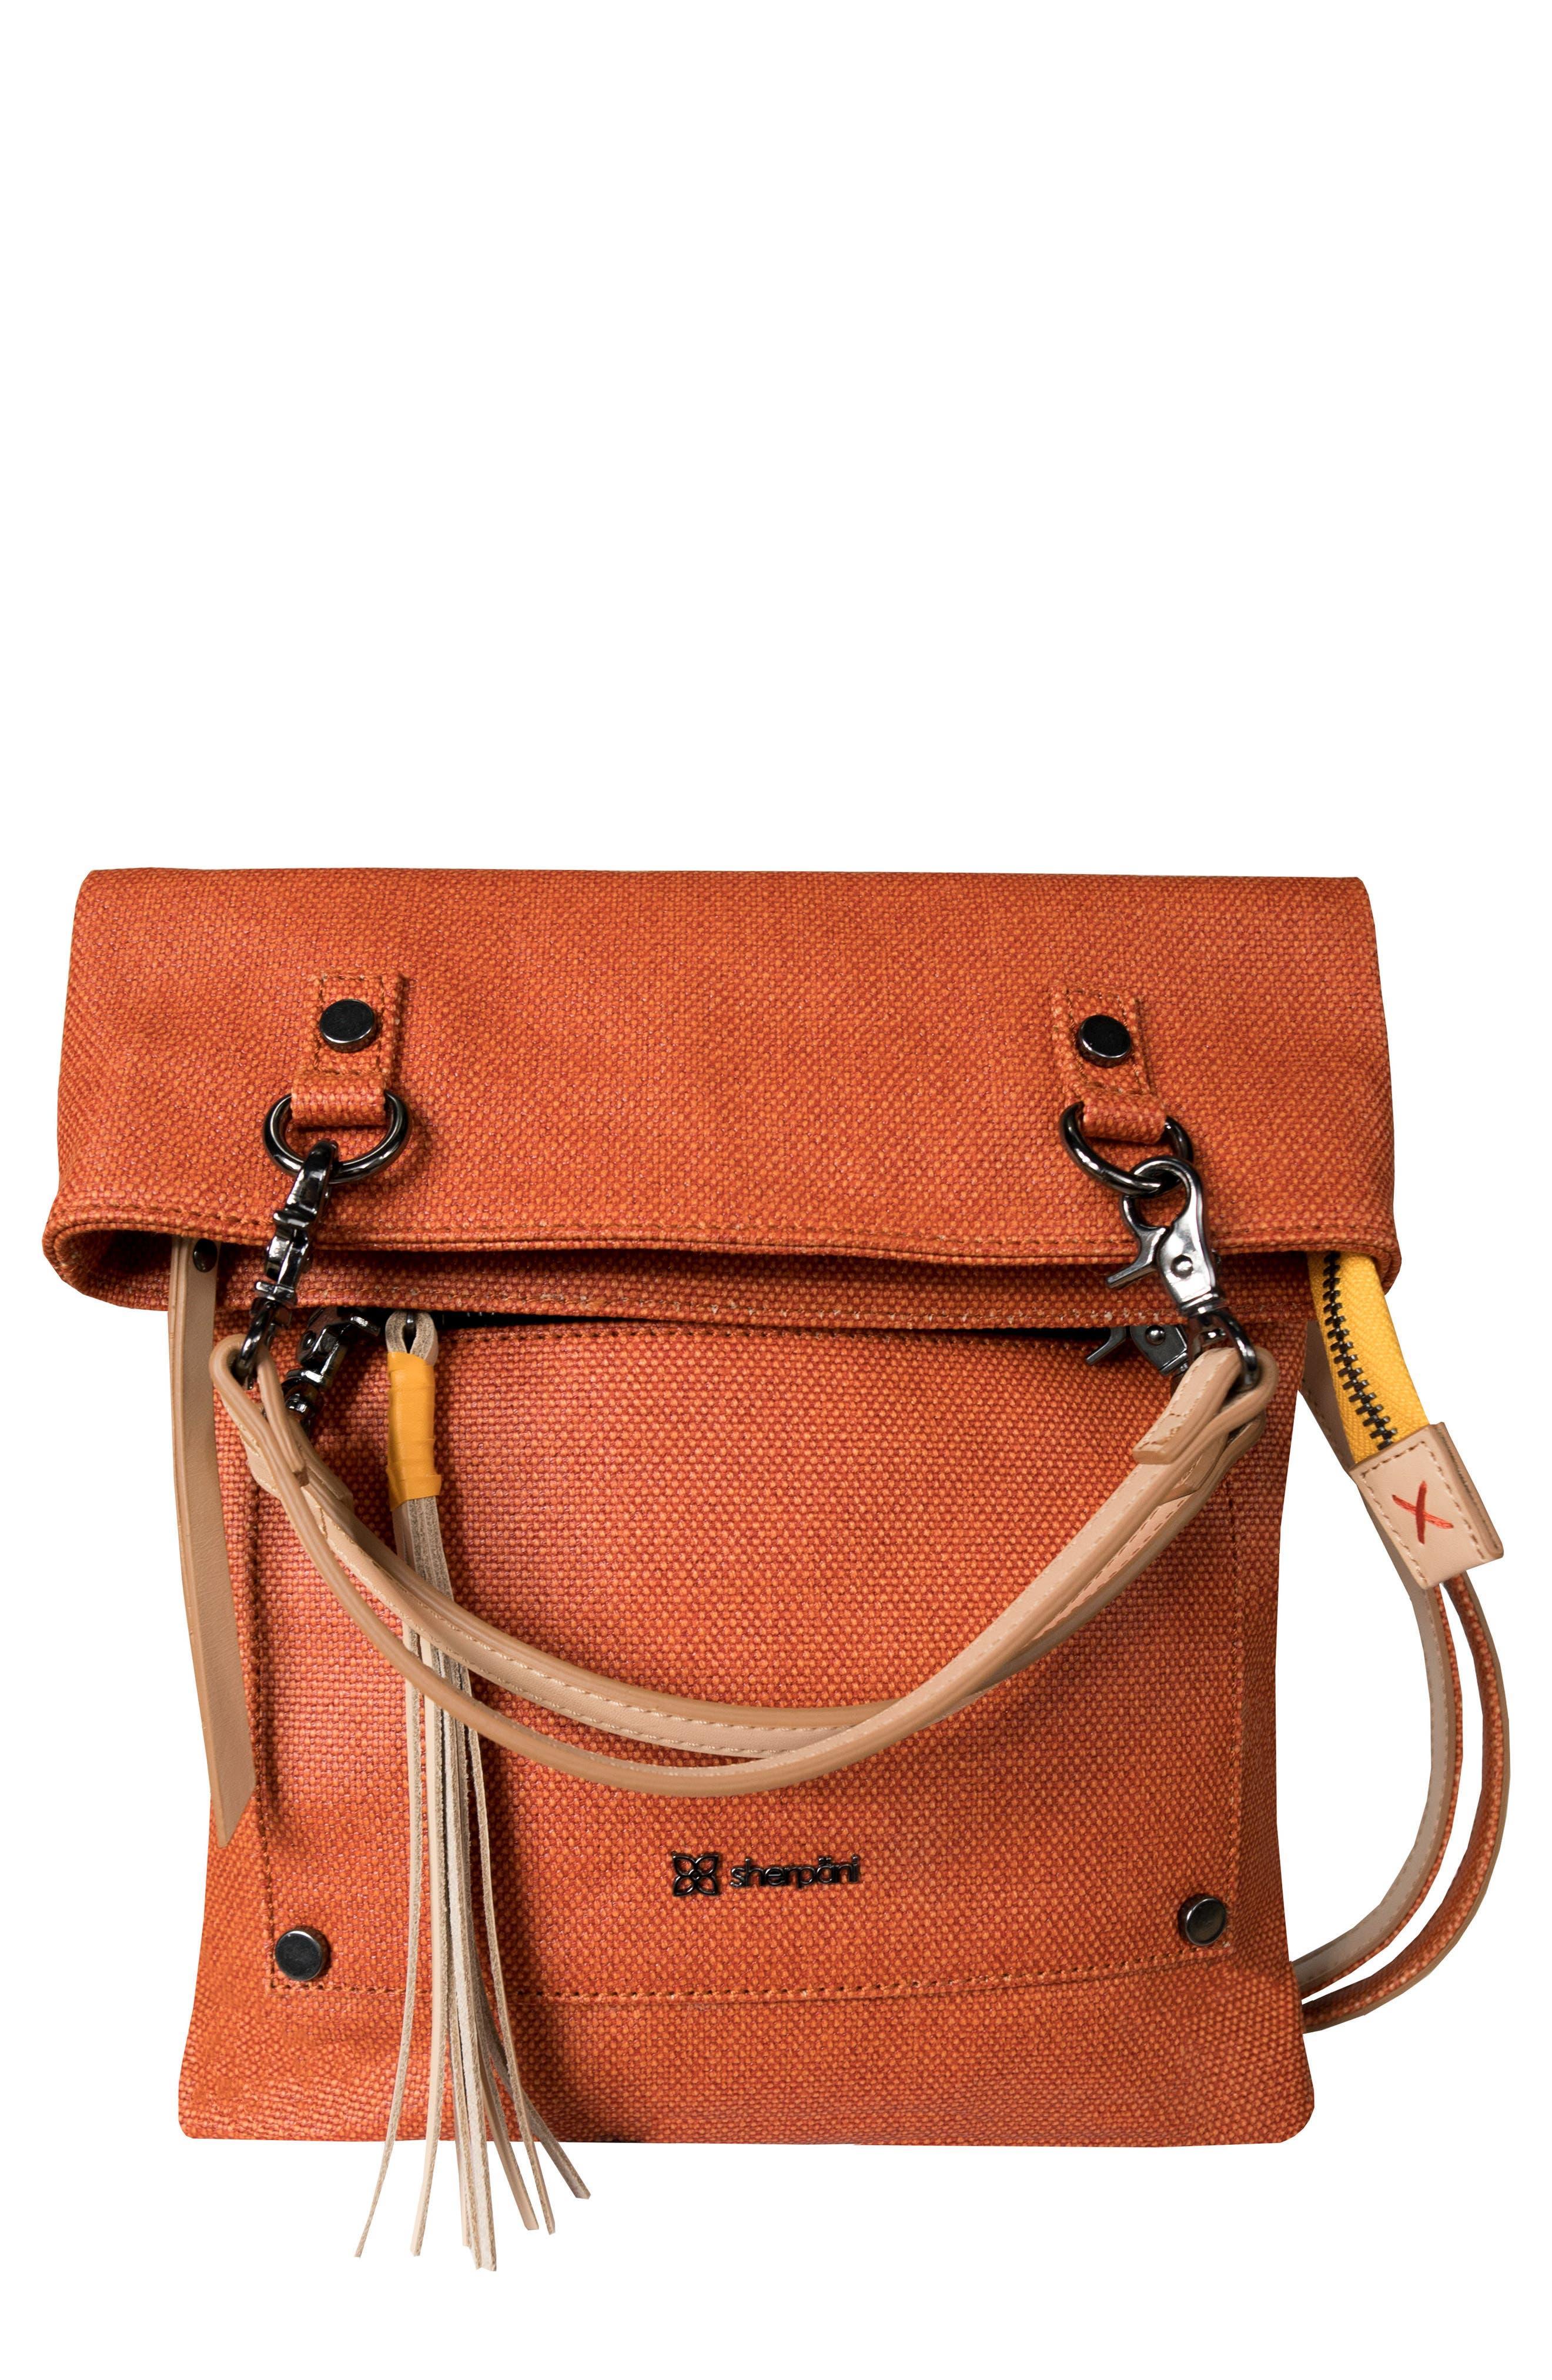 Rebel Coated Canvas Crossbody Bag,                         Main,                         color, Copper